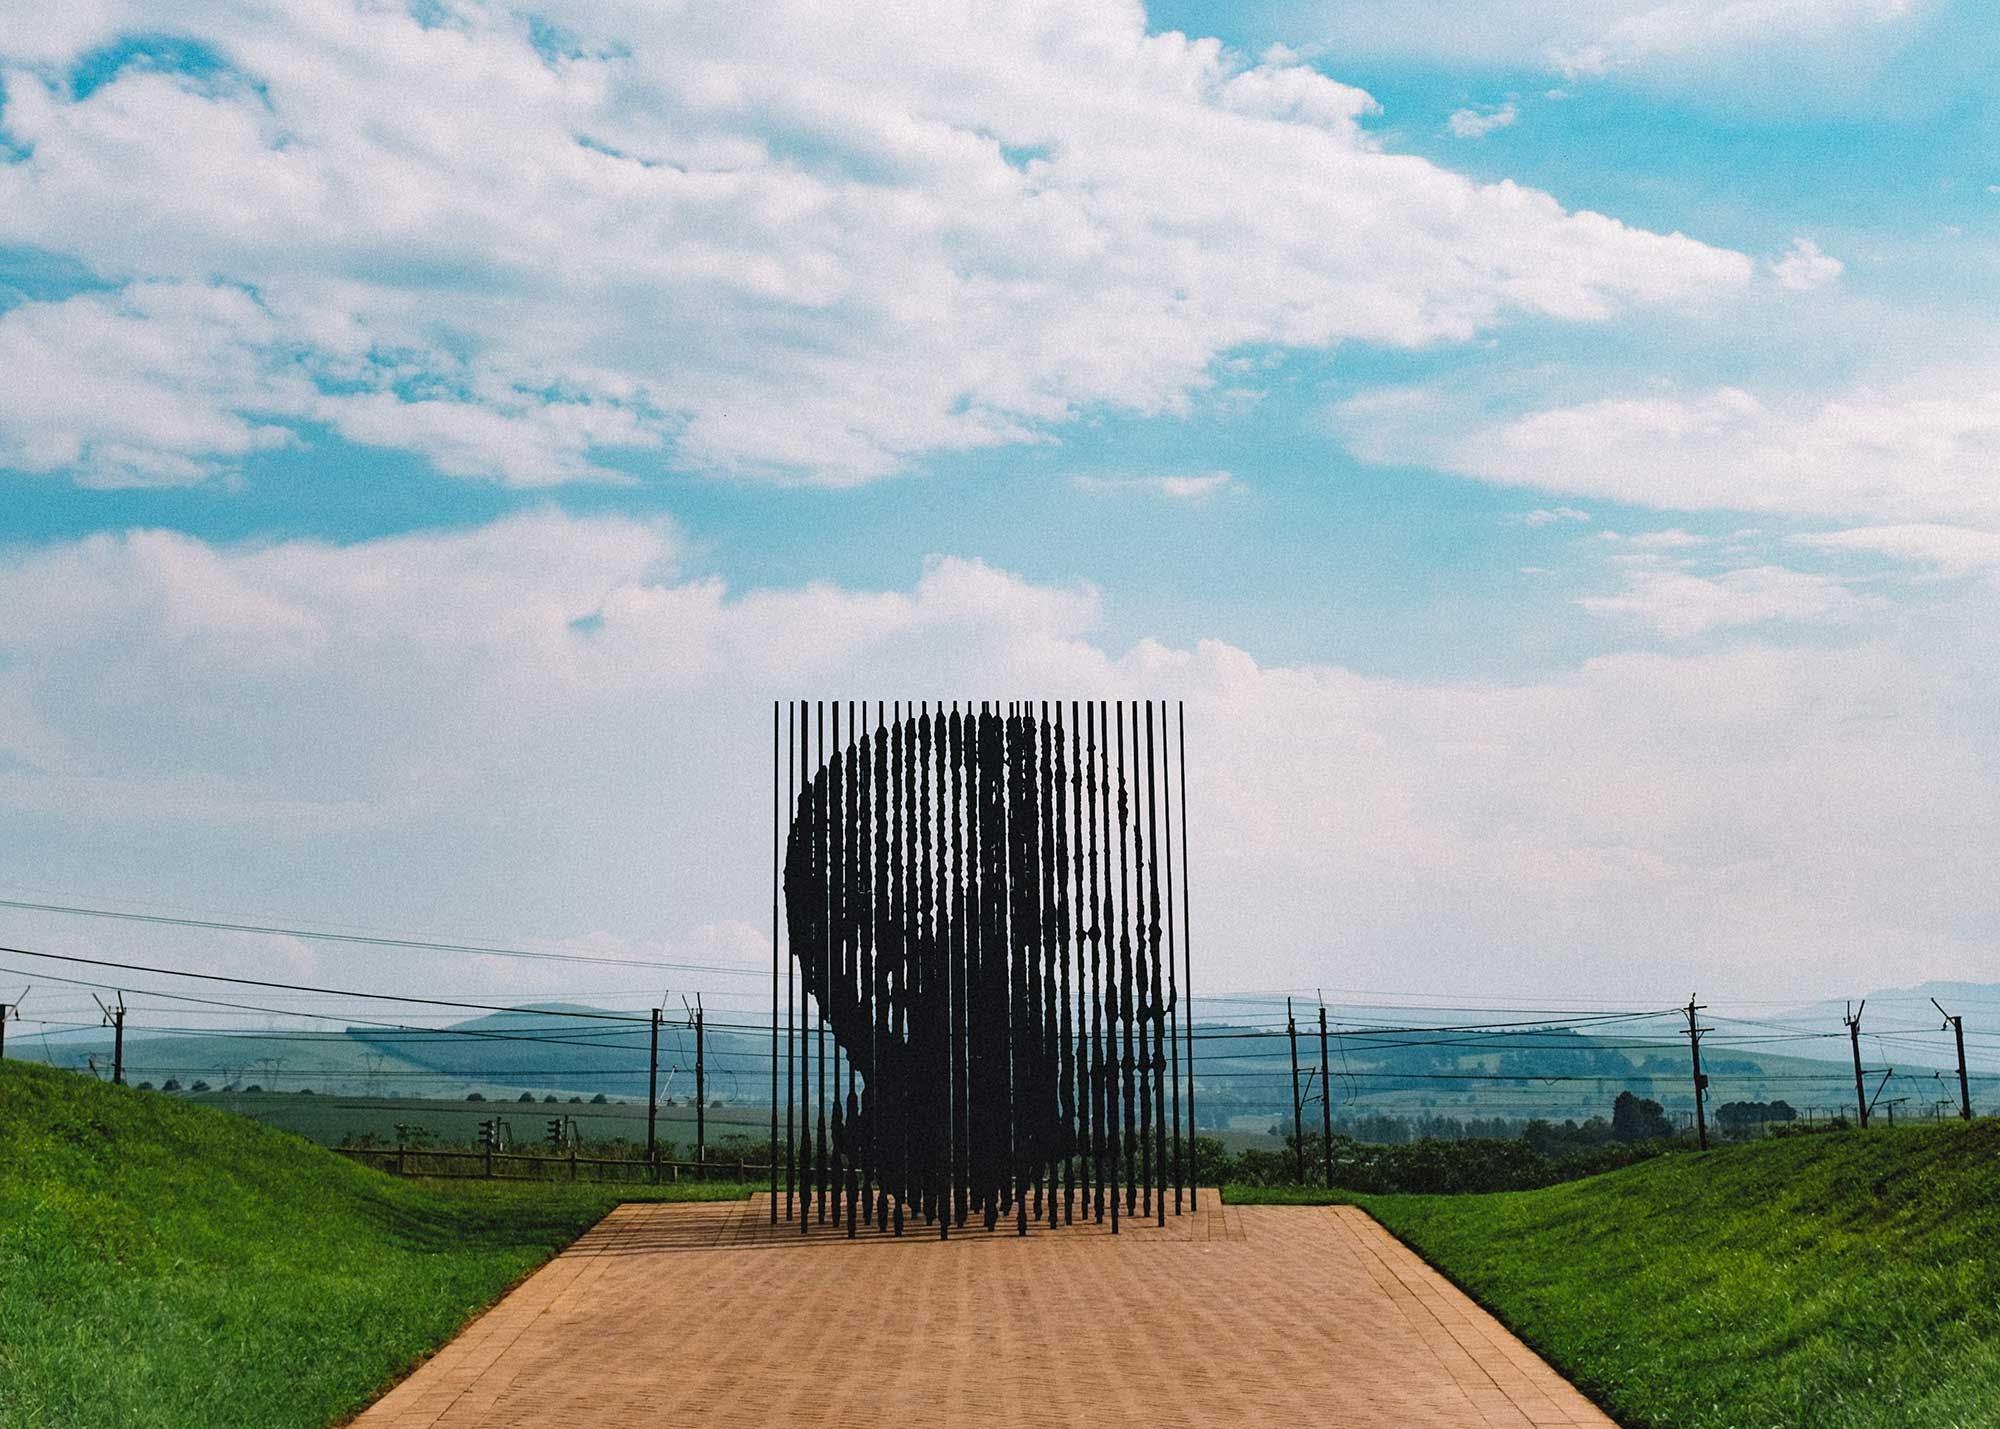 An art memorial to Nelson Mandela